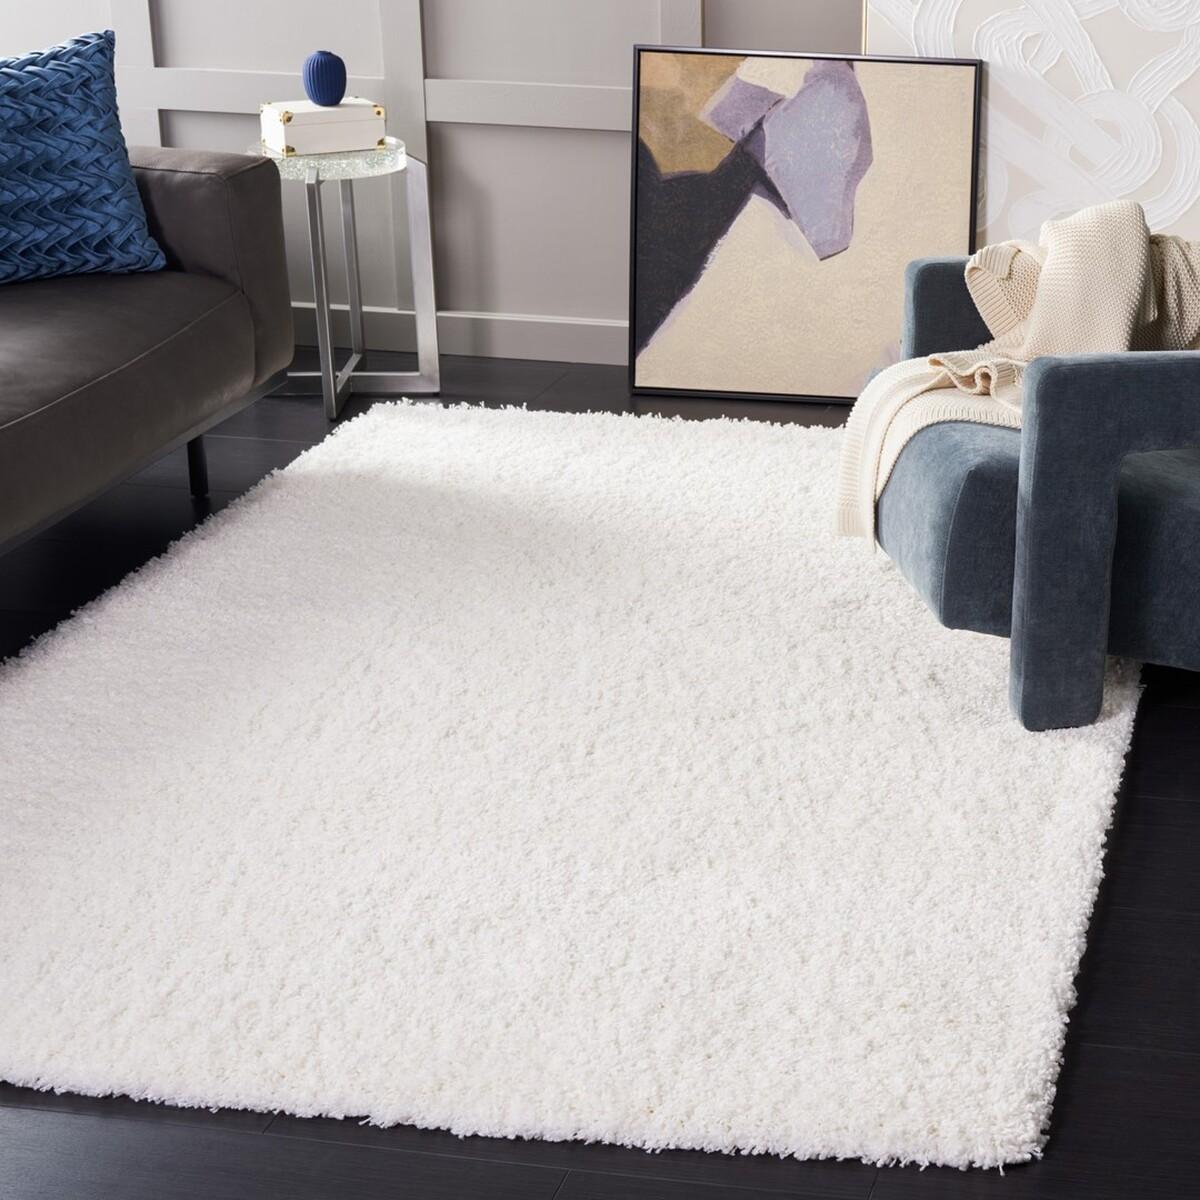 faux sheepskin rug 60x90cm white